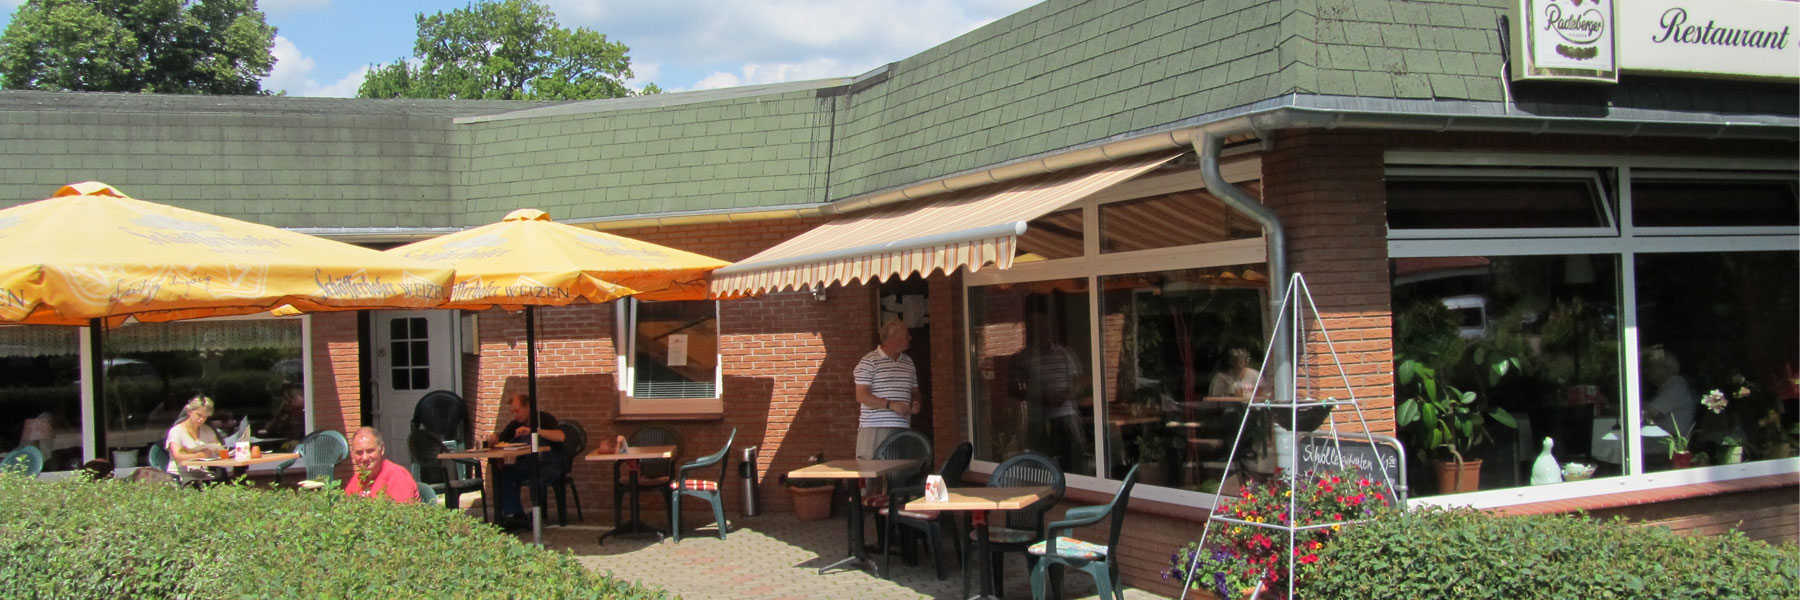 Terrasse - Restaurant & Café Lorenz